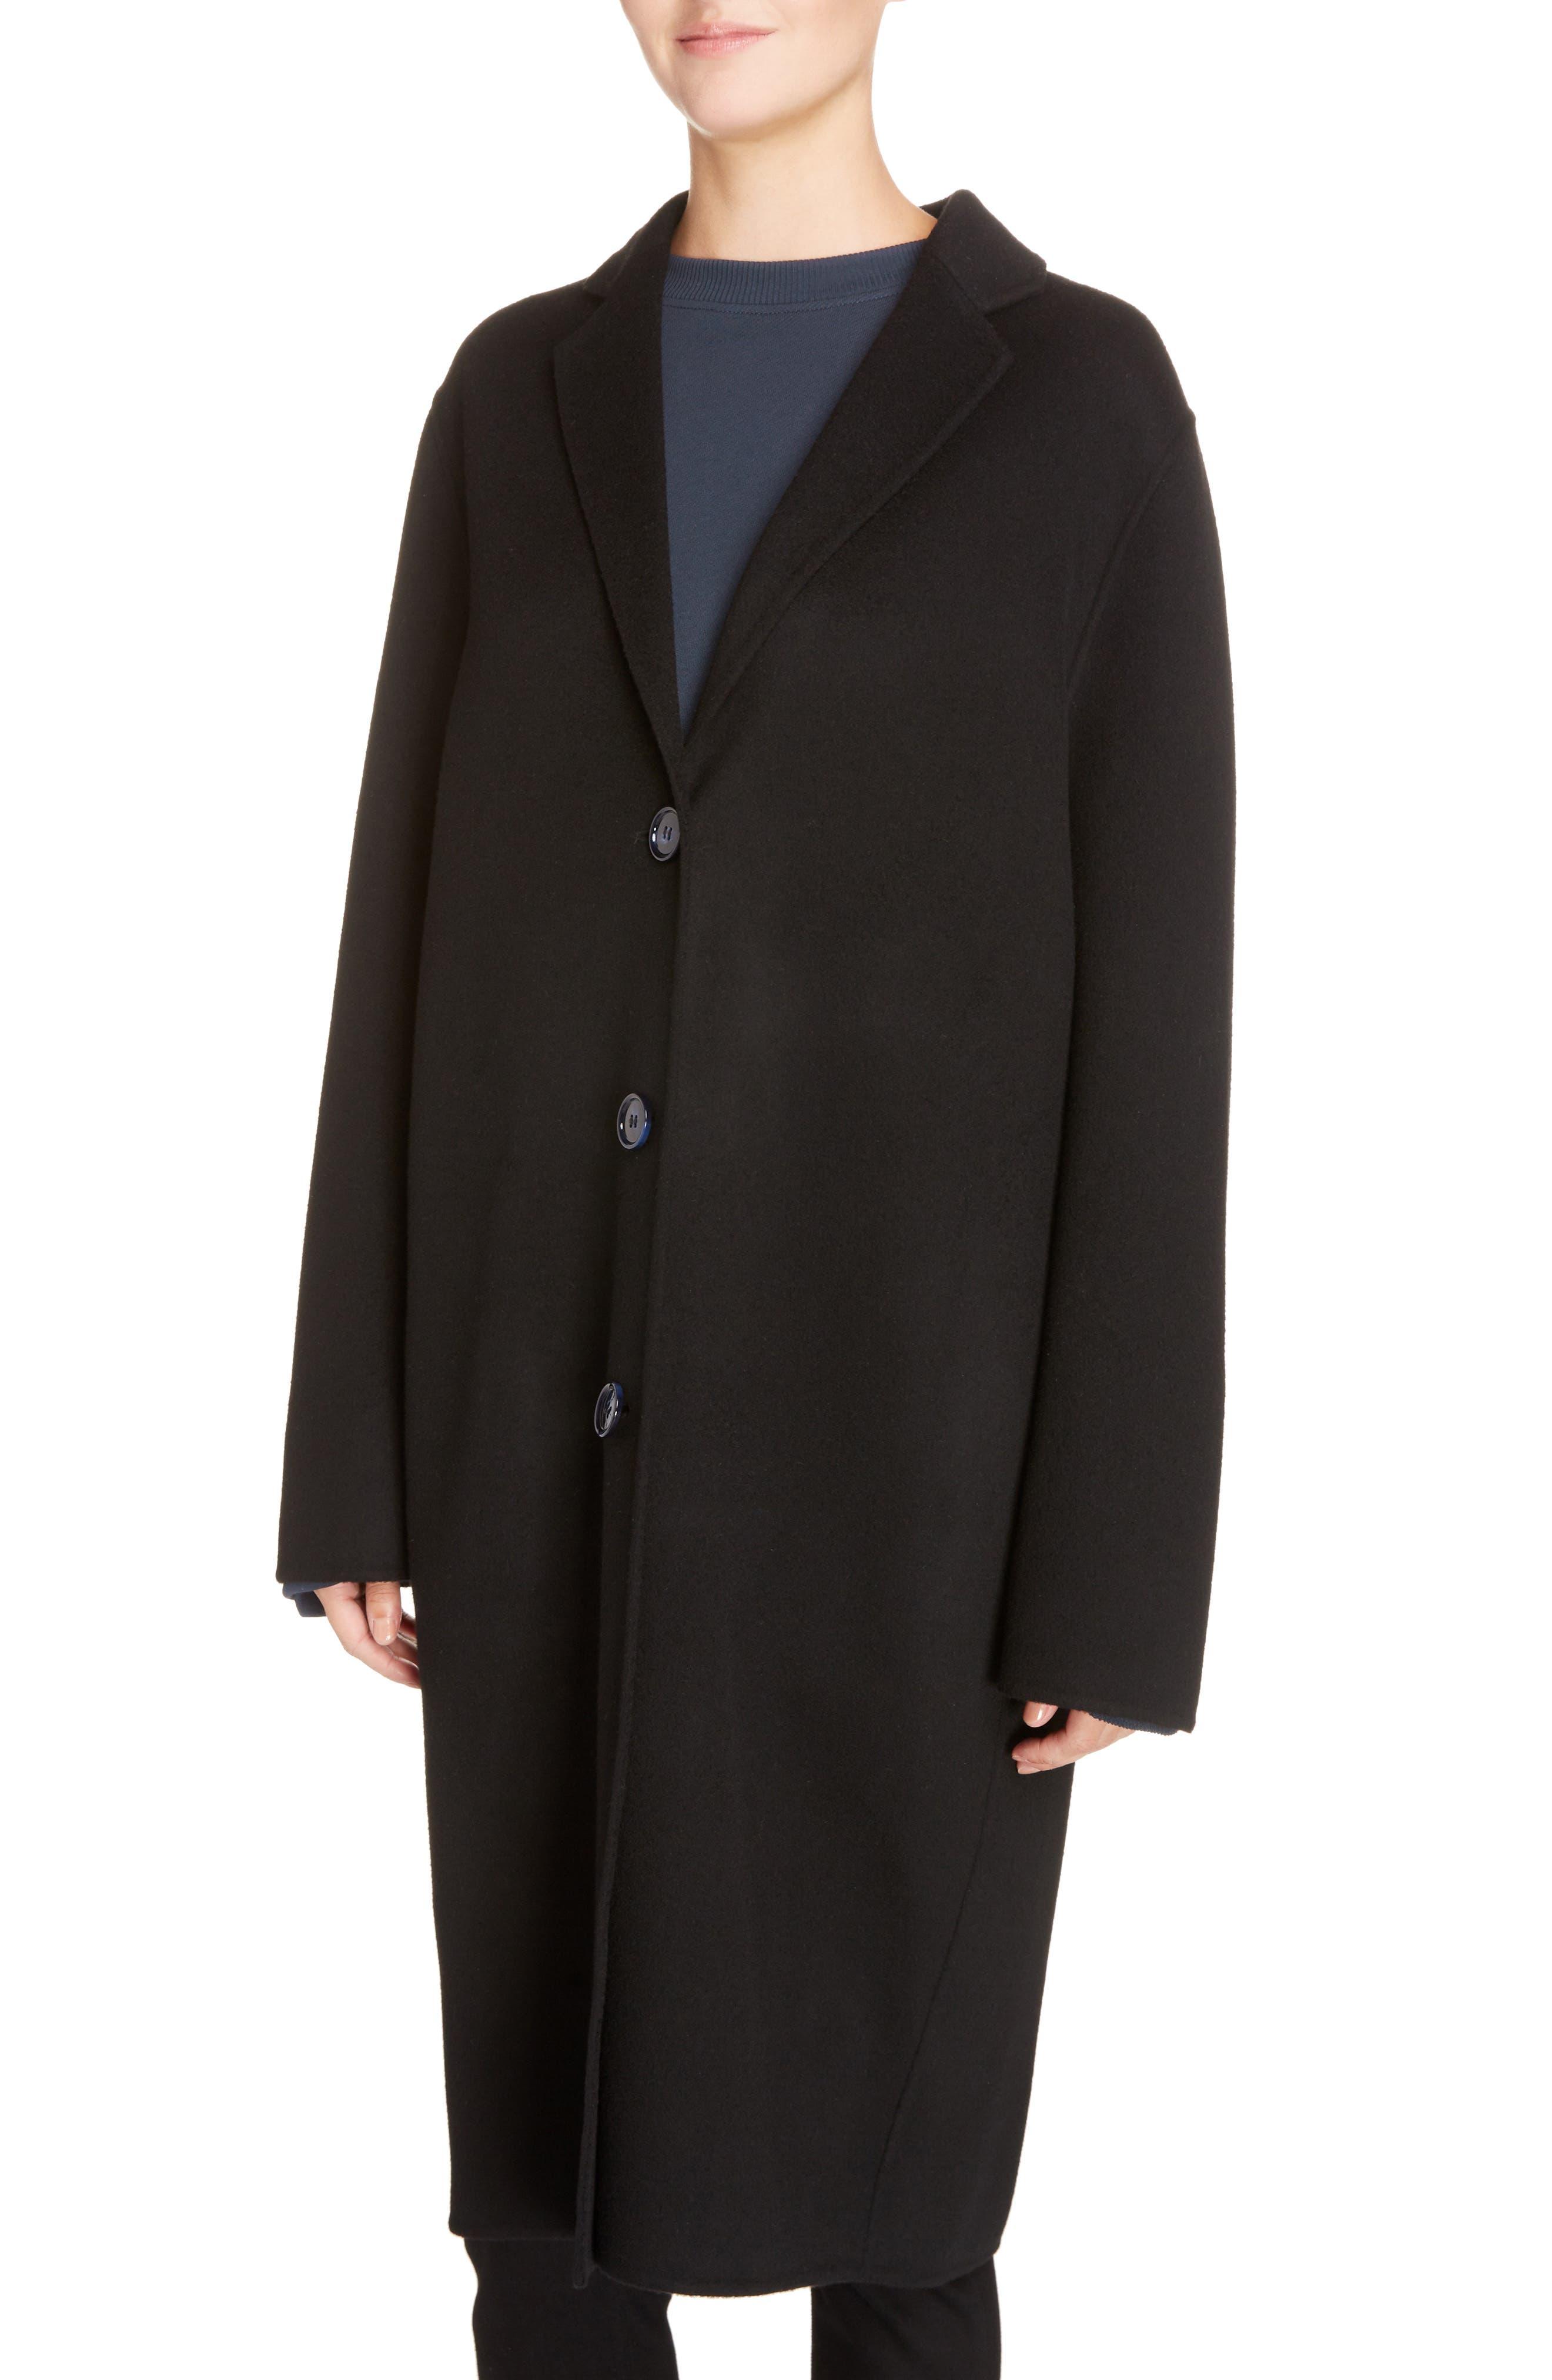 Avalon Wool & Cashmere Coat,                             Alternate thumbnail 4, color,                             BLACK